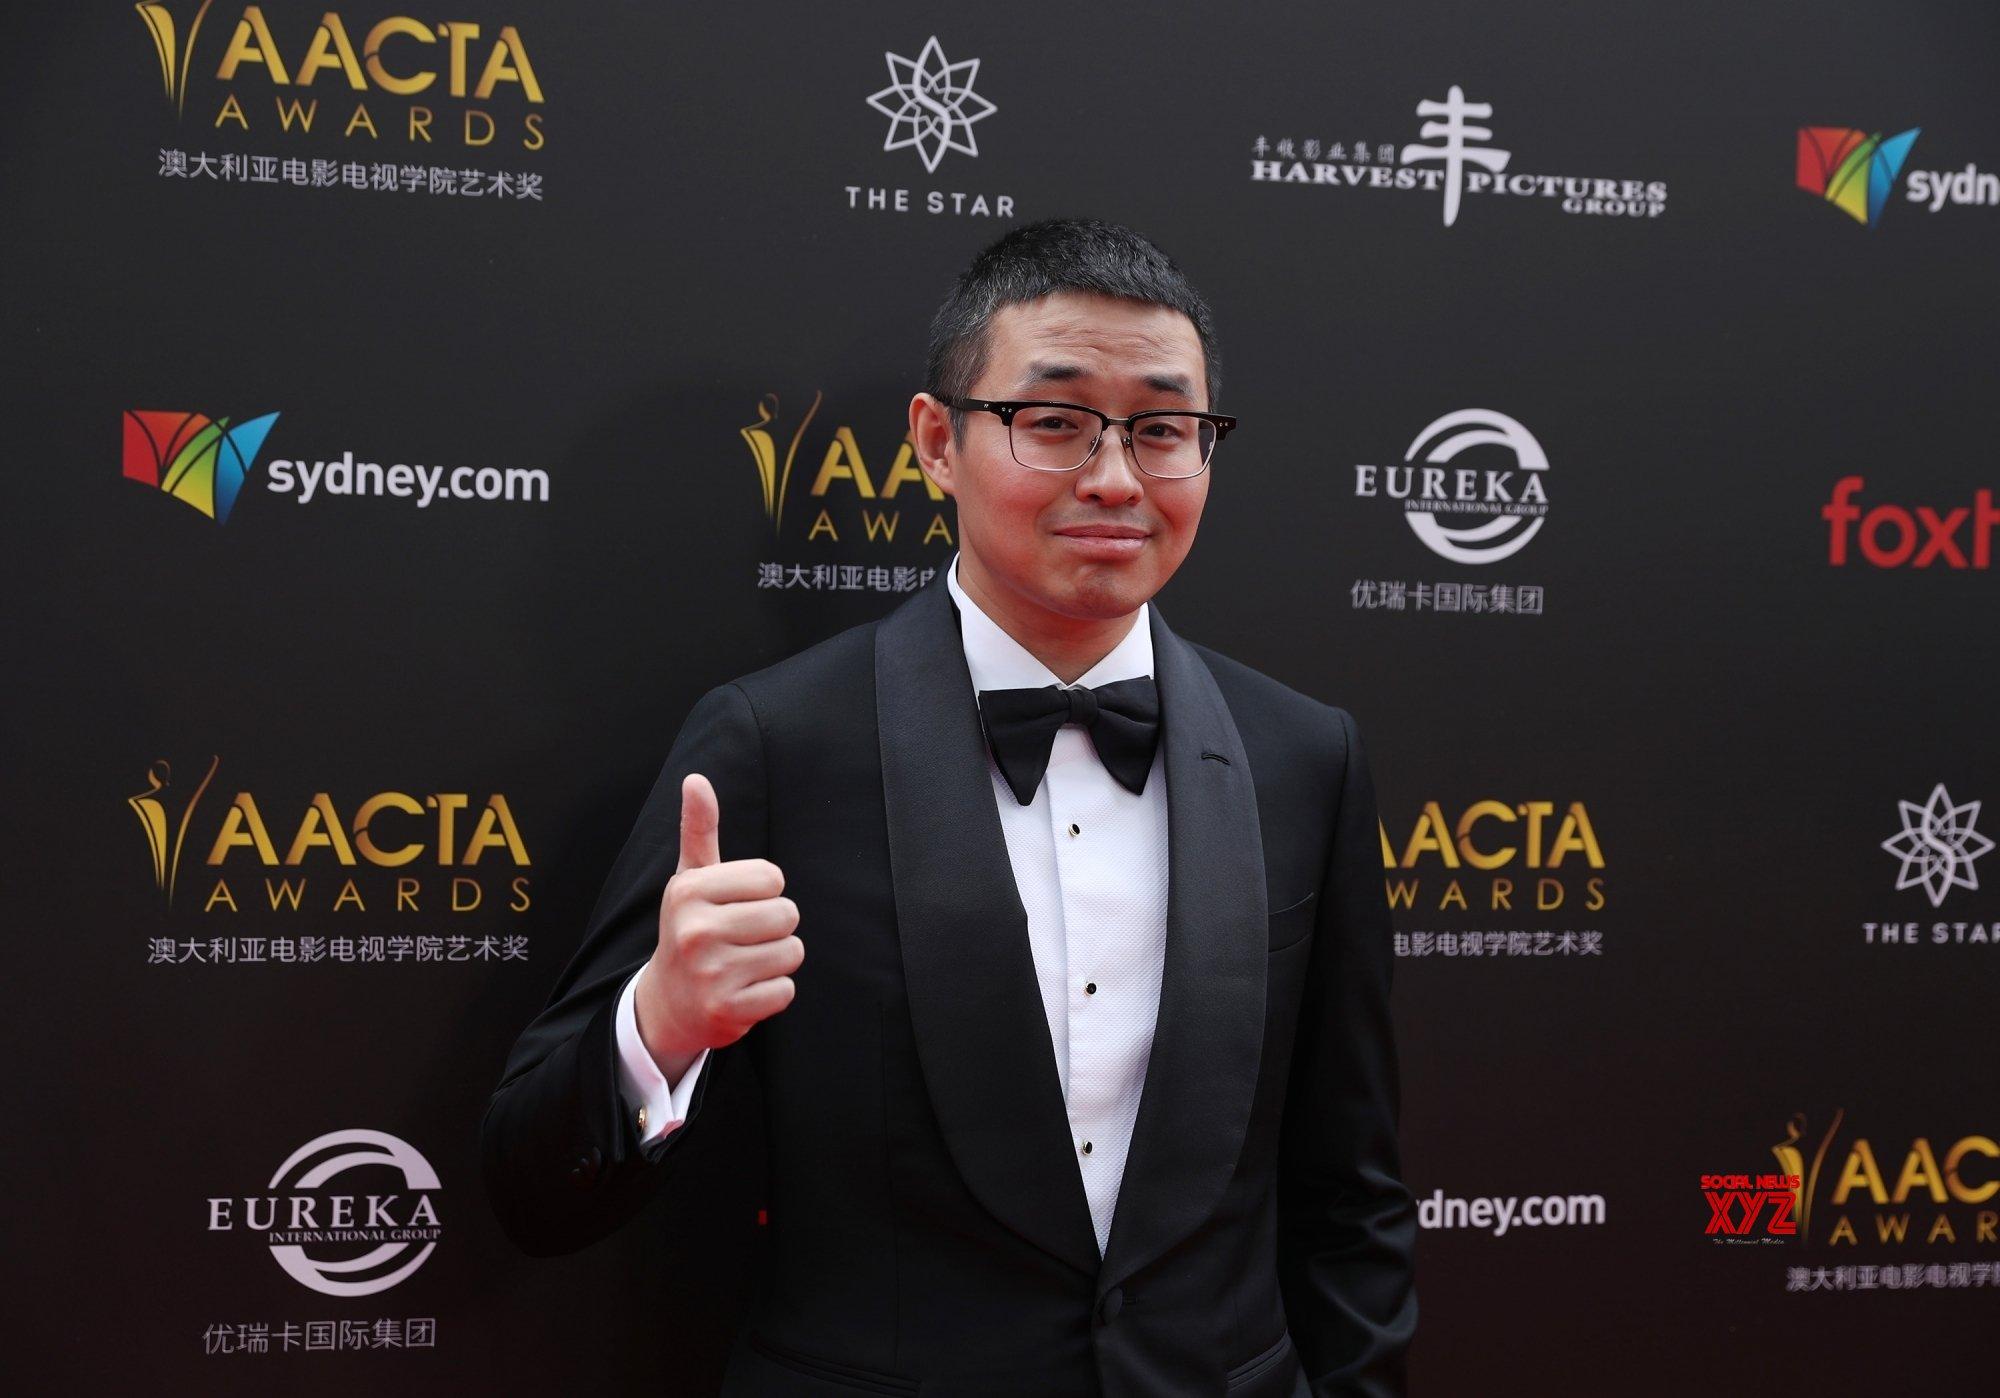 AUSTRALIA SYDNEY AACTA AWARDS CEREMONY #Gallery